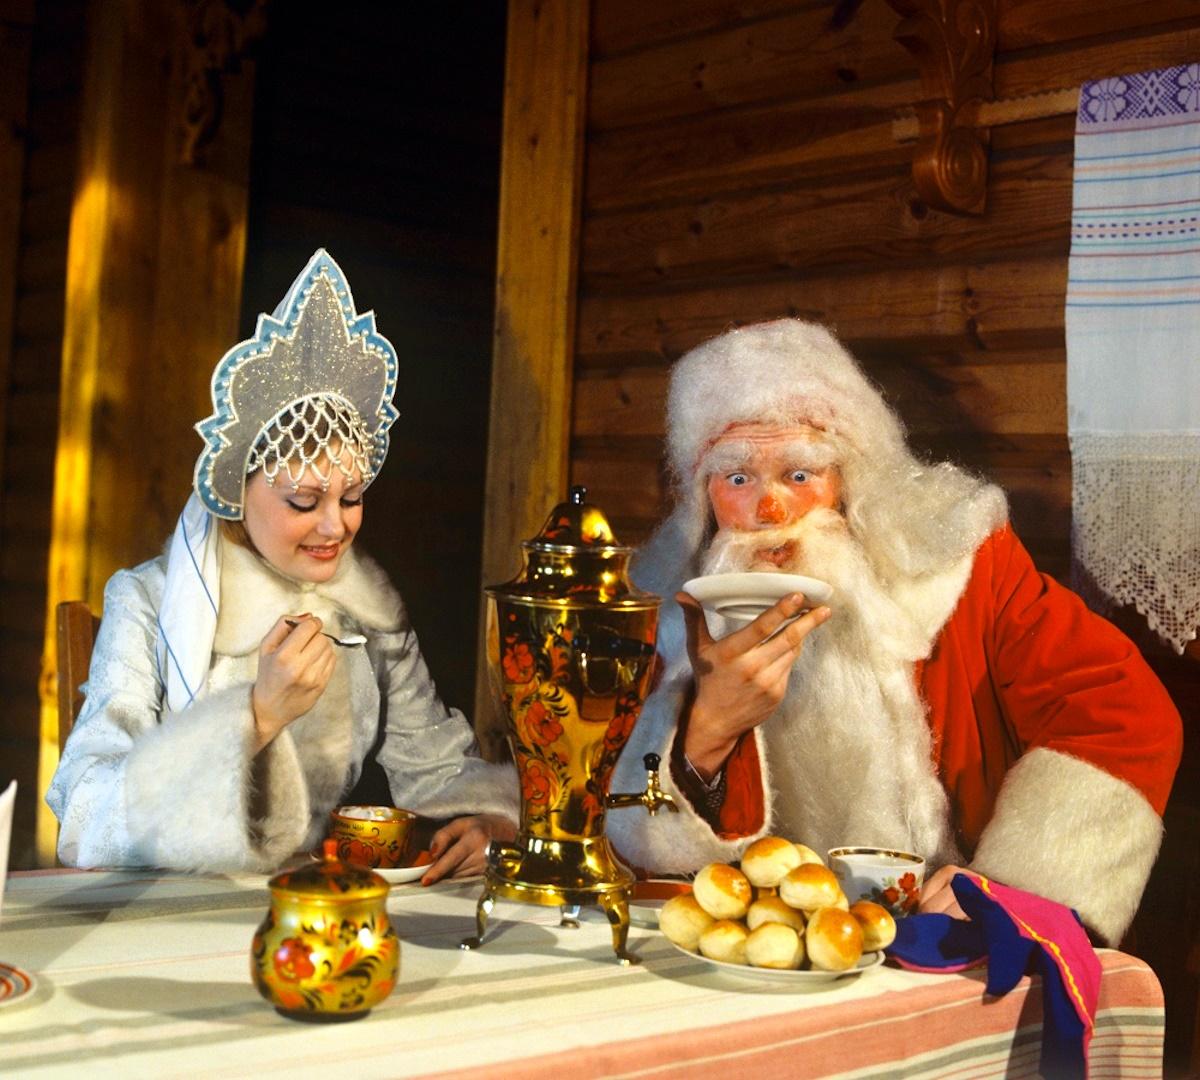 00 Soviet New Year 13. Altai Krai 1980. 01.01.15